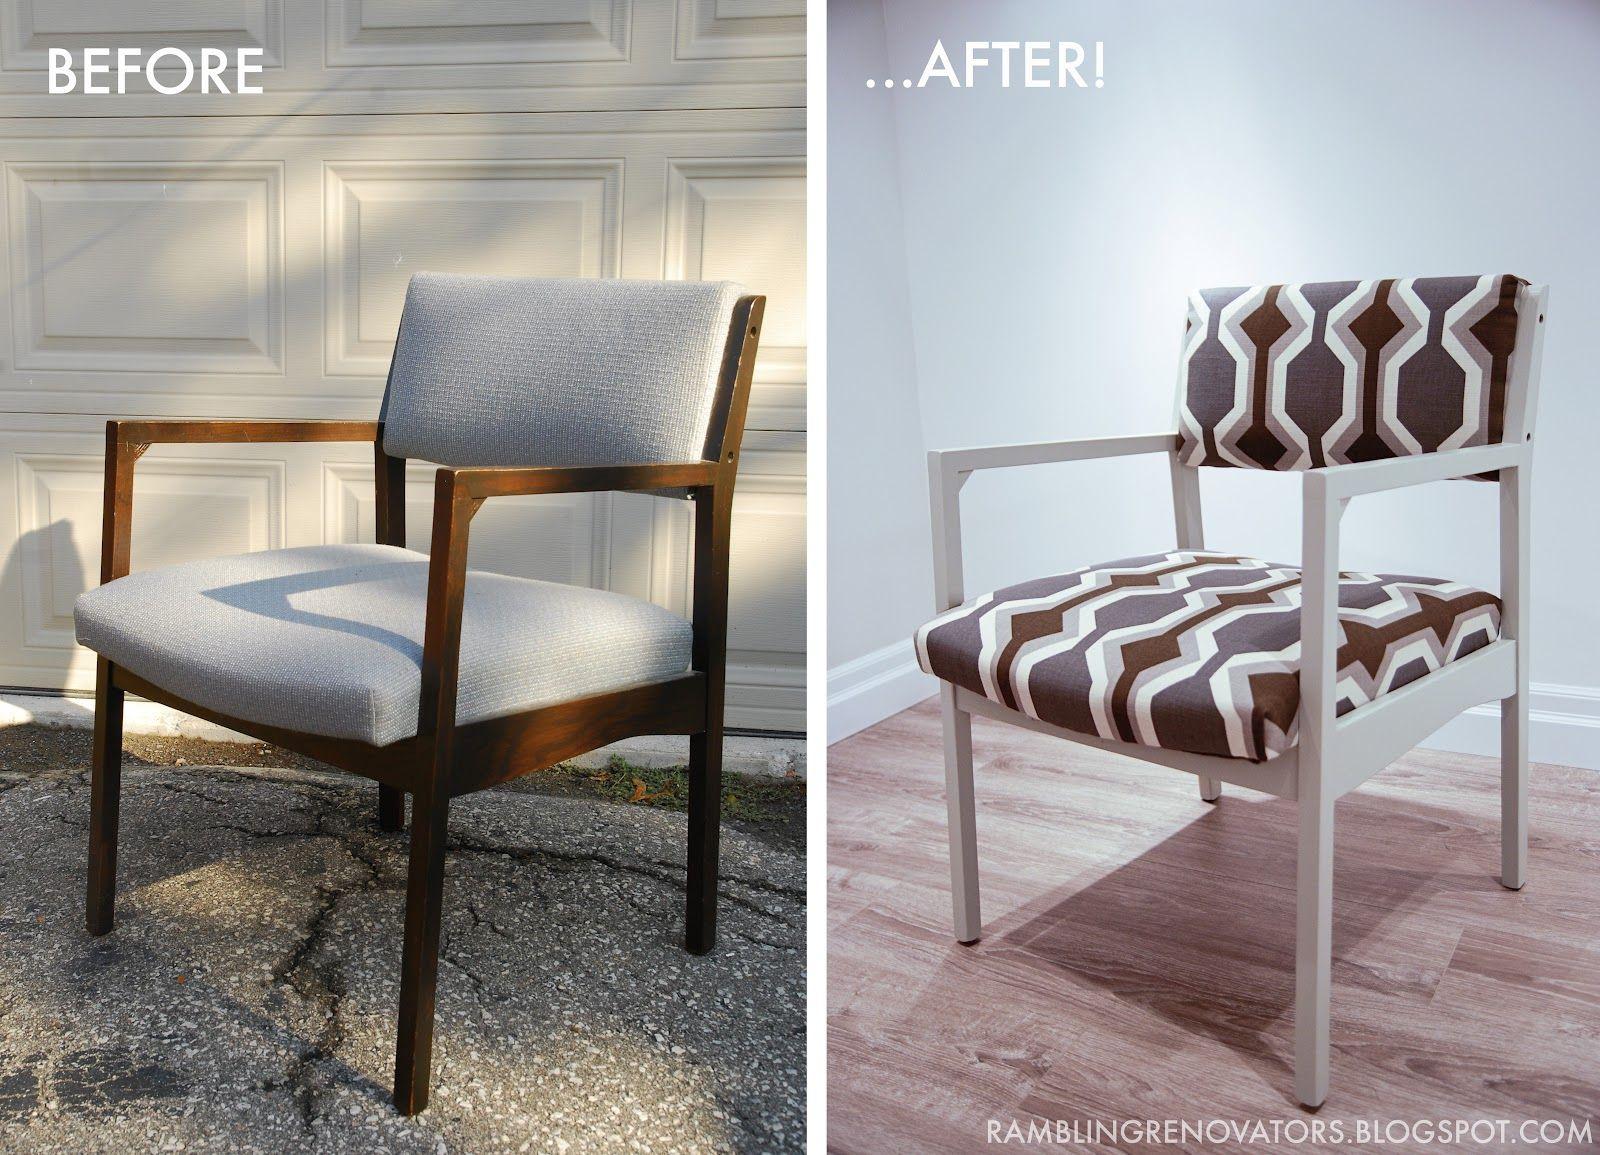 Diy Retro Chair Makeover In 2019 Diy List Office